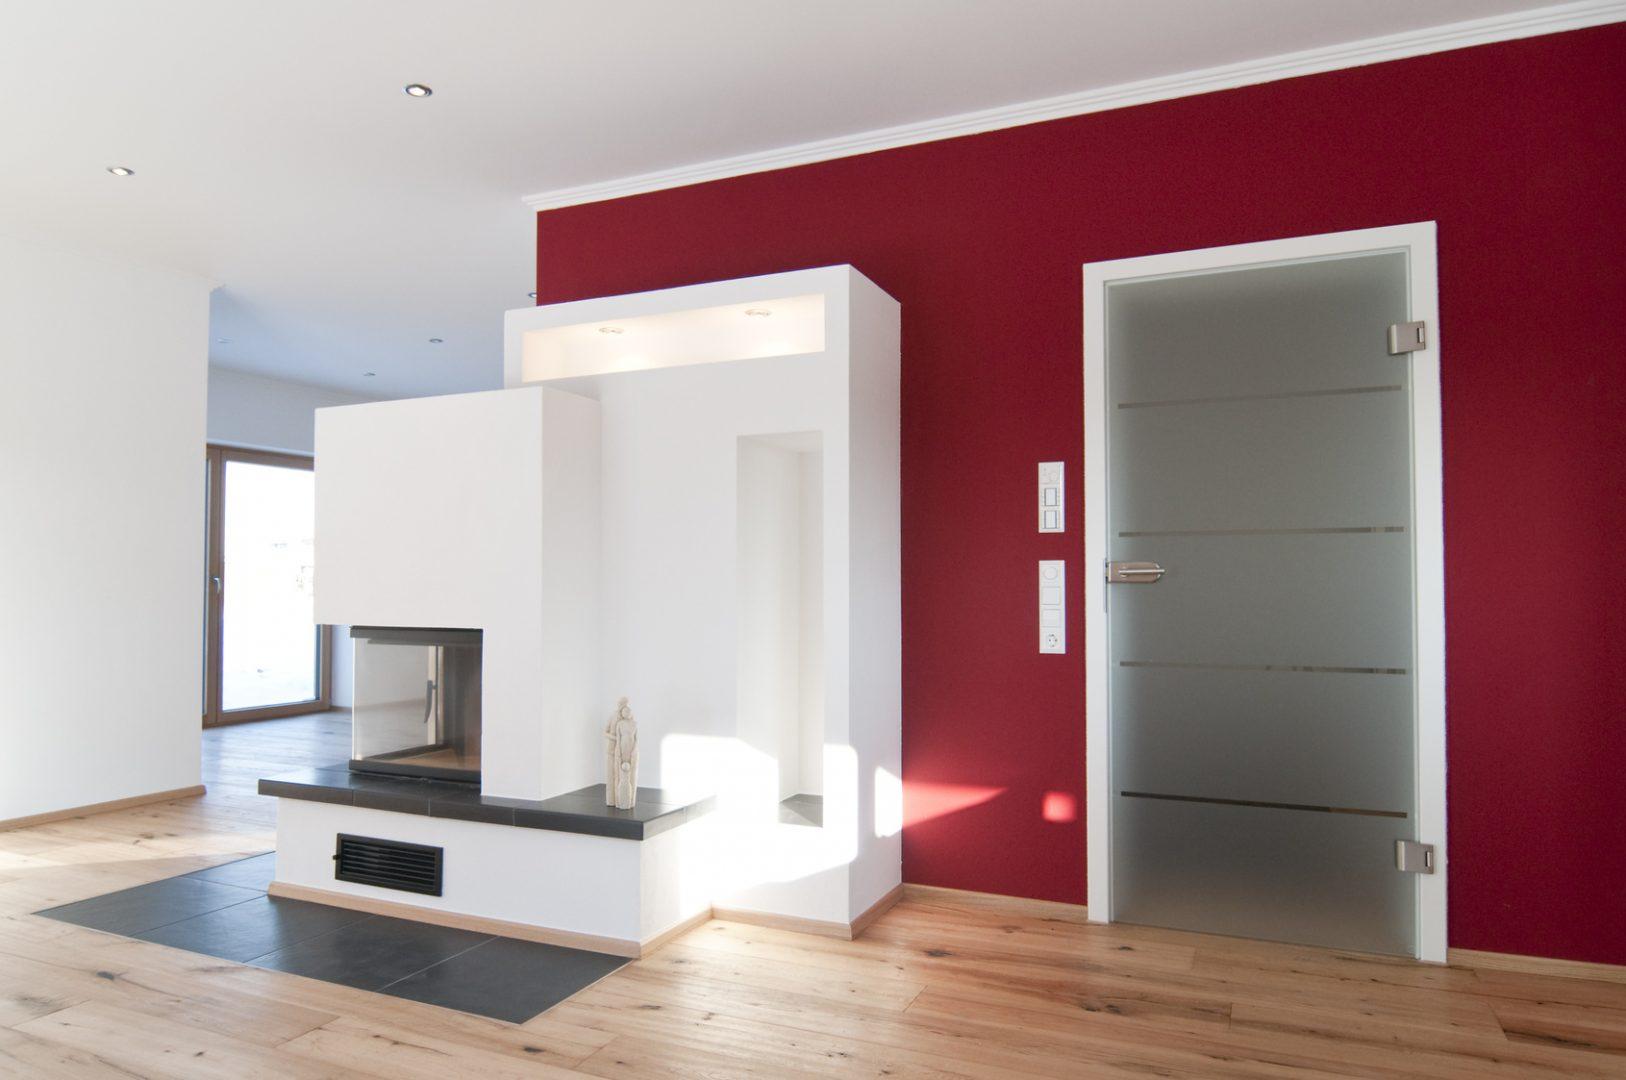 maler und lackierarbeiten thoma immobilien bonn. Black Bedroom Furniture Sets. Home Design Ideas